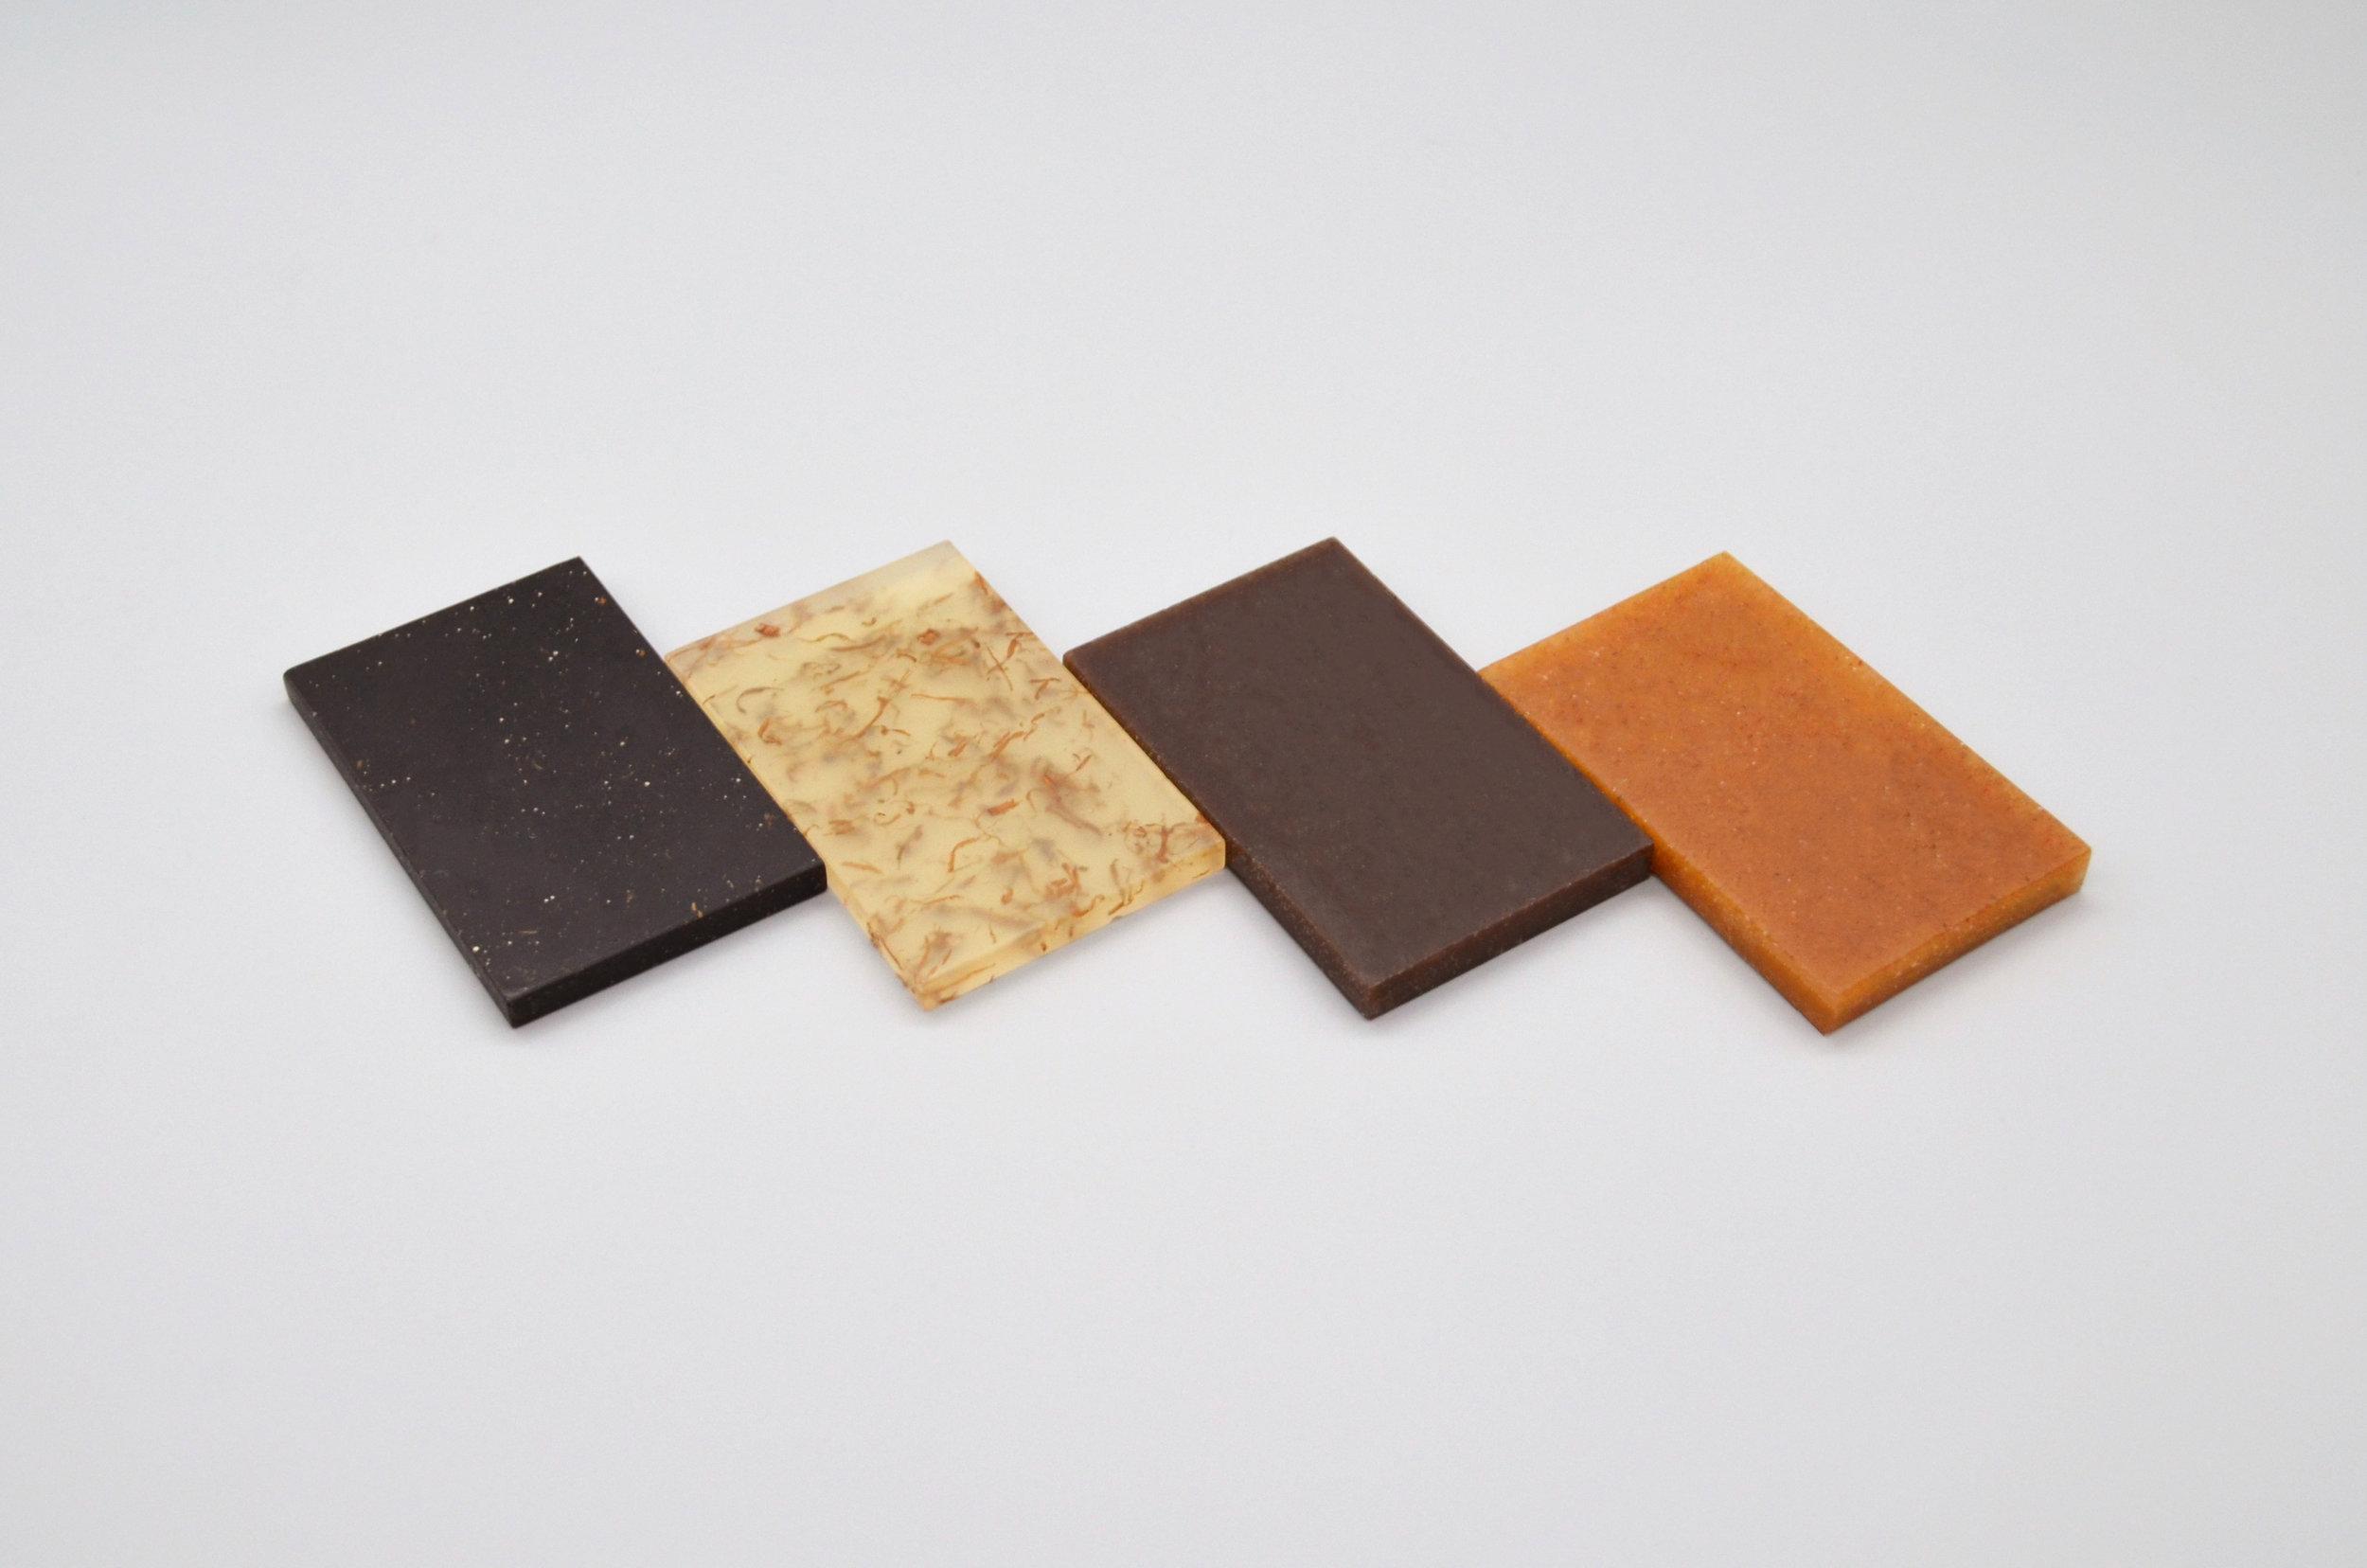 Samples of Chips Board potato-waste biomaterial.